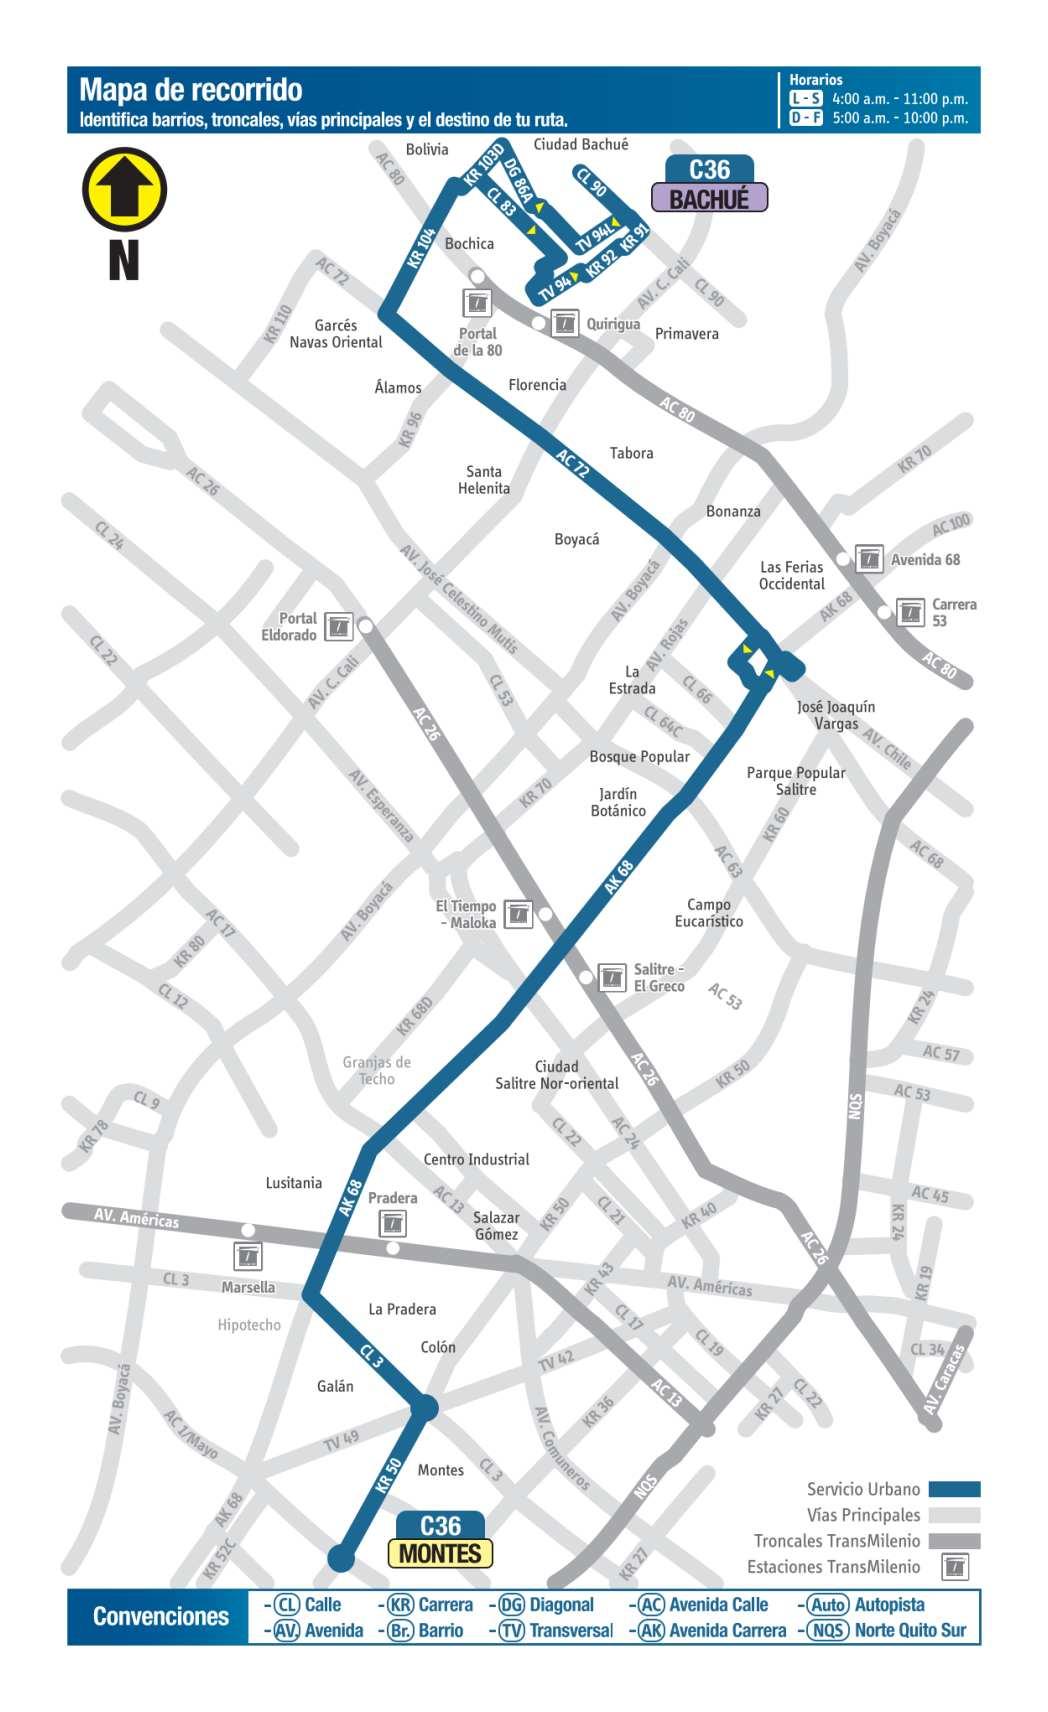 C36 Bachué - Montes, mapa bus urbano Bogotá